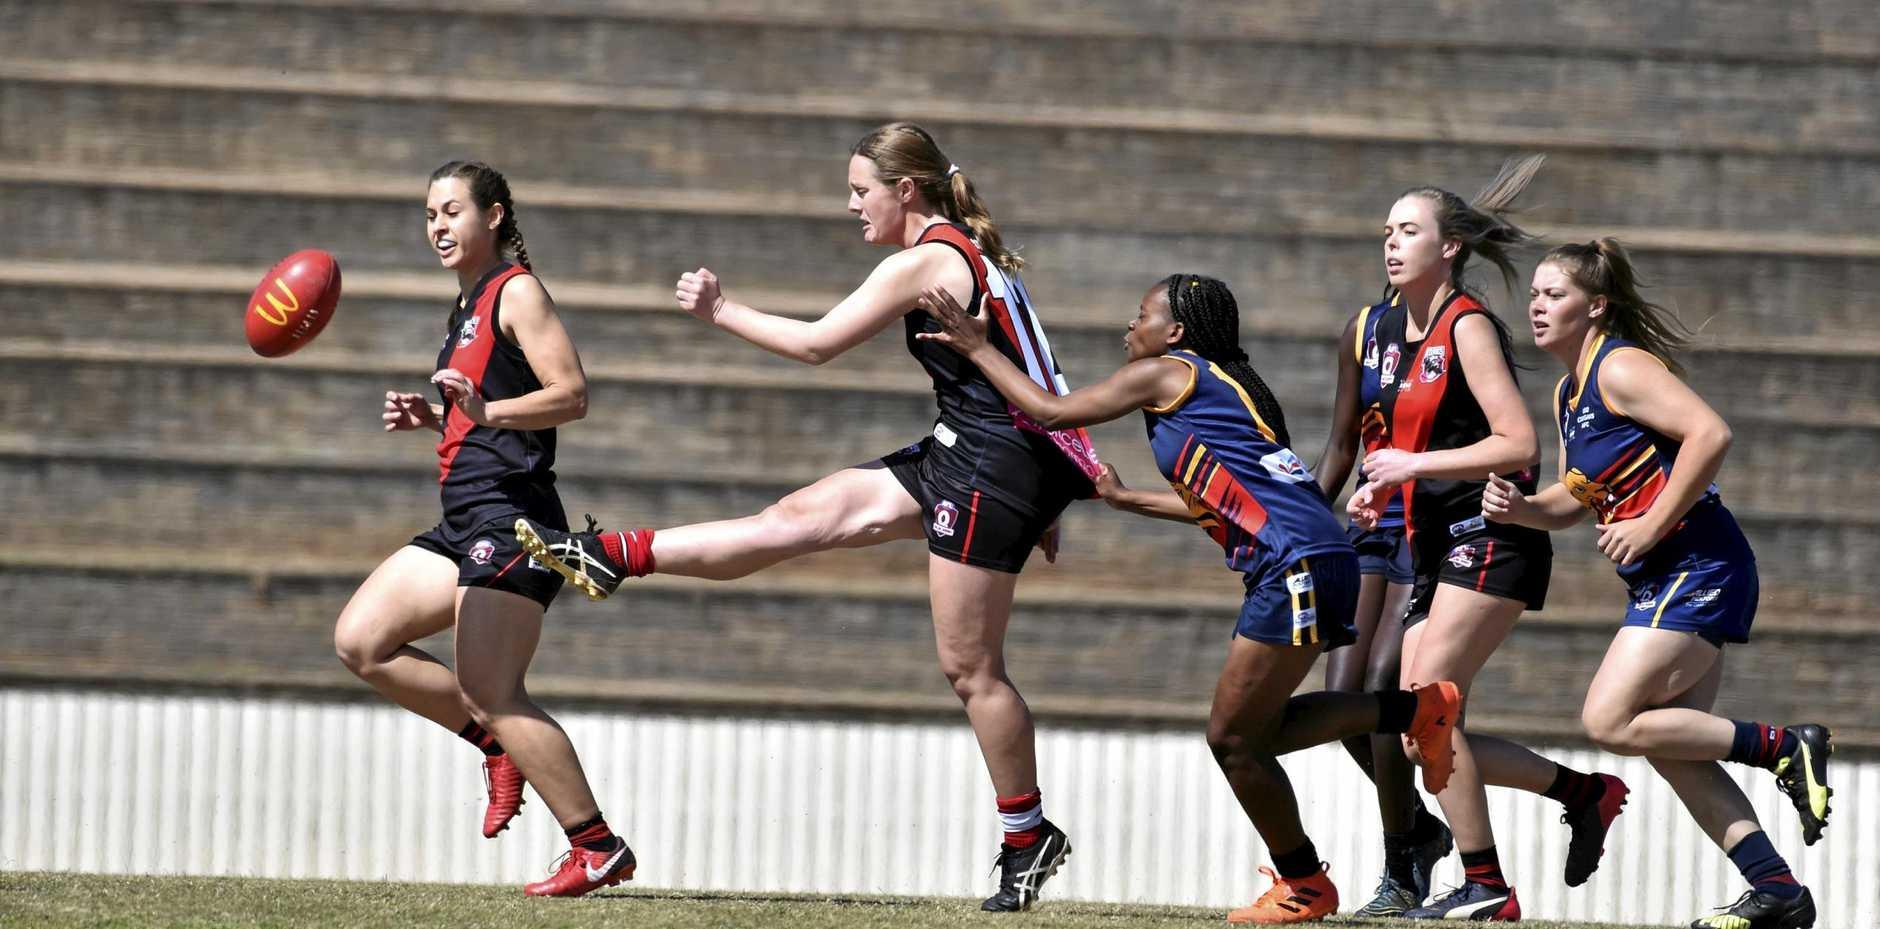 Chloe Crothers kicks forward for South Toowoomba.